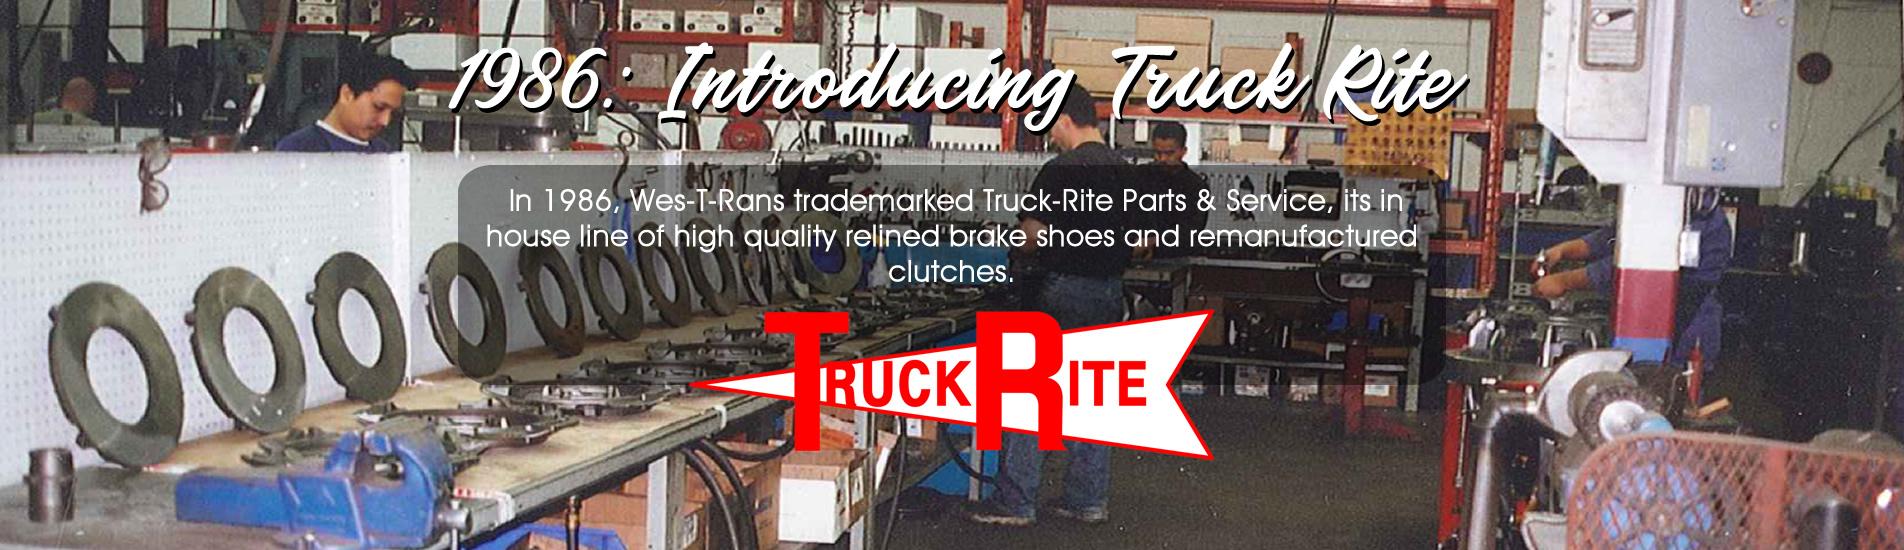 westrans-introducing-truck-rite-1986